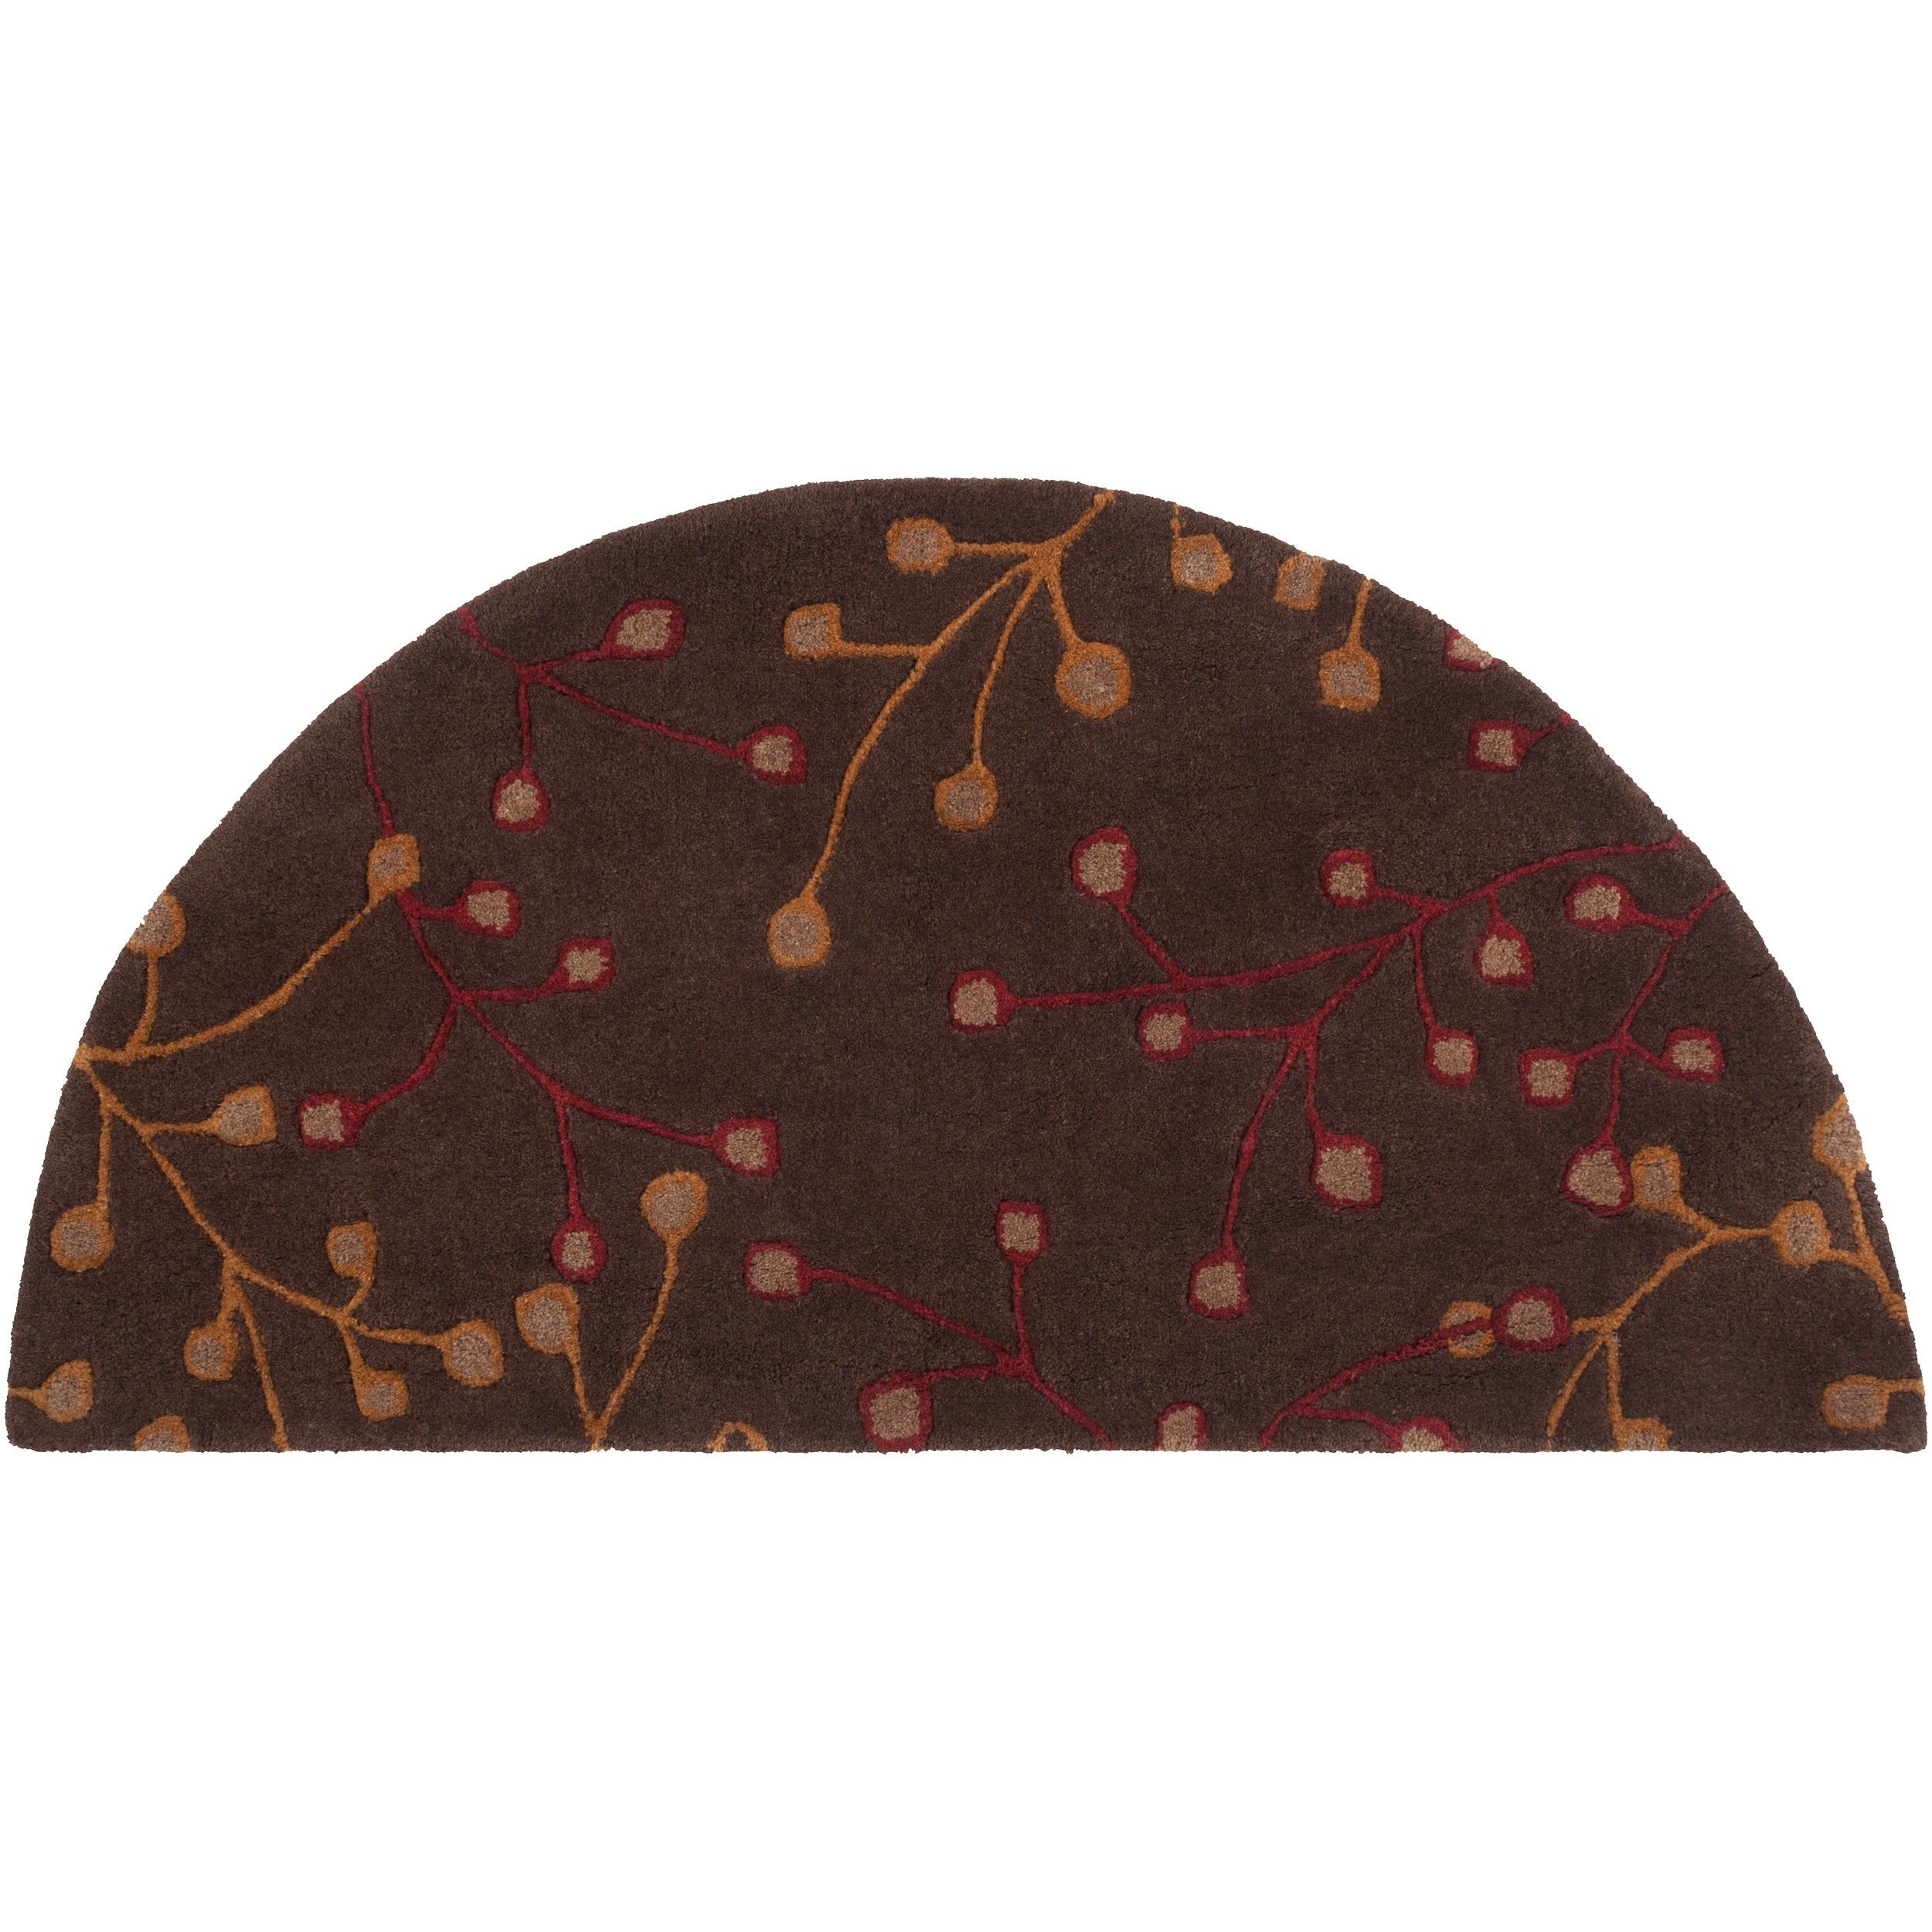 Hand-tufted Fawaris Chocolate Wool Rug (2' x 4' Hearth)